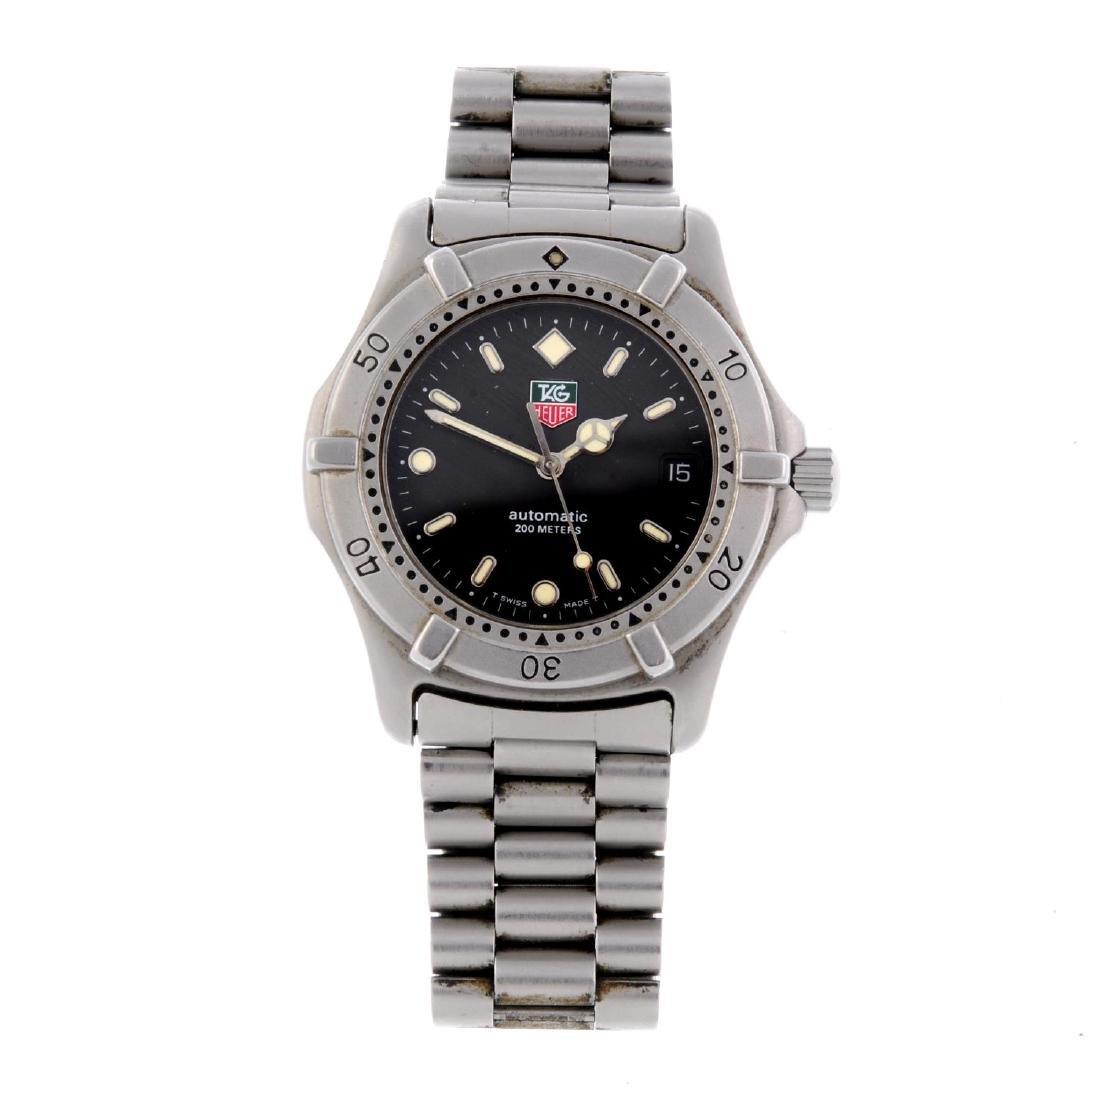 TAG HEUER - a gentleman's 2000 Series bracelet watch.